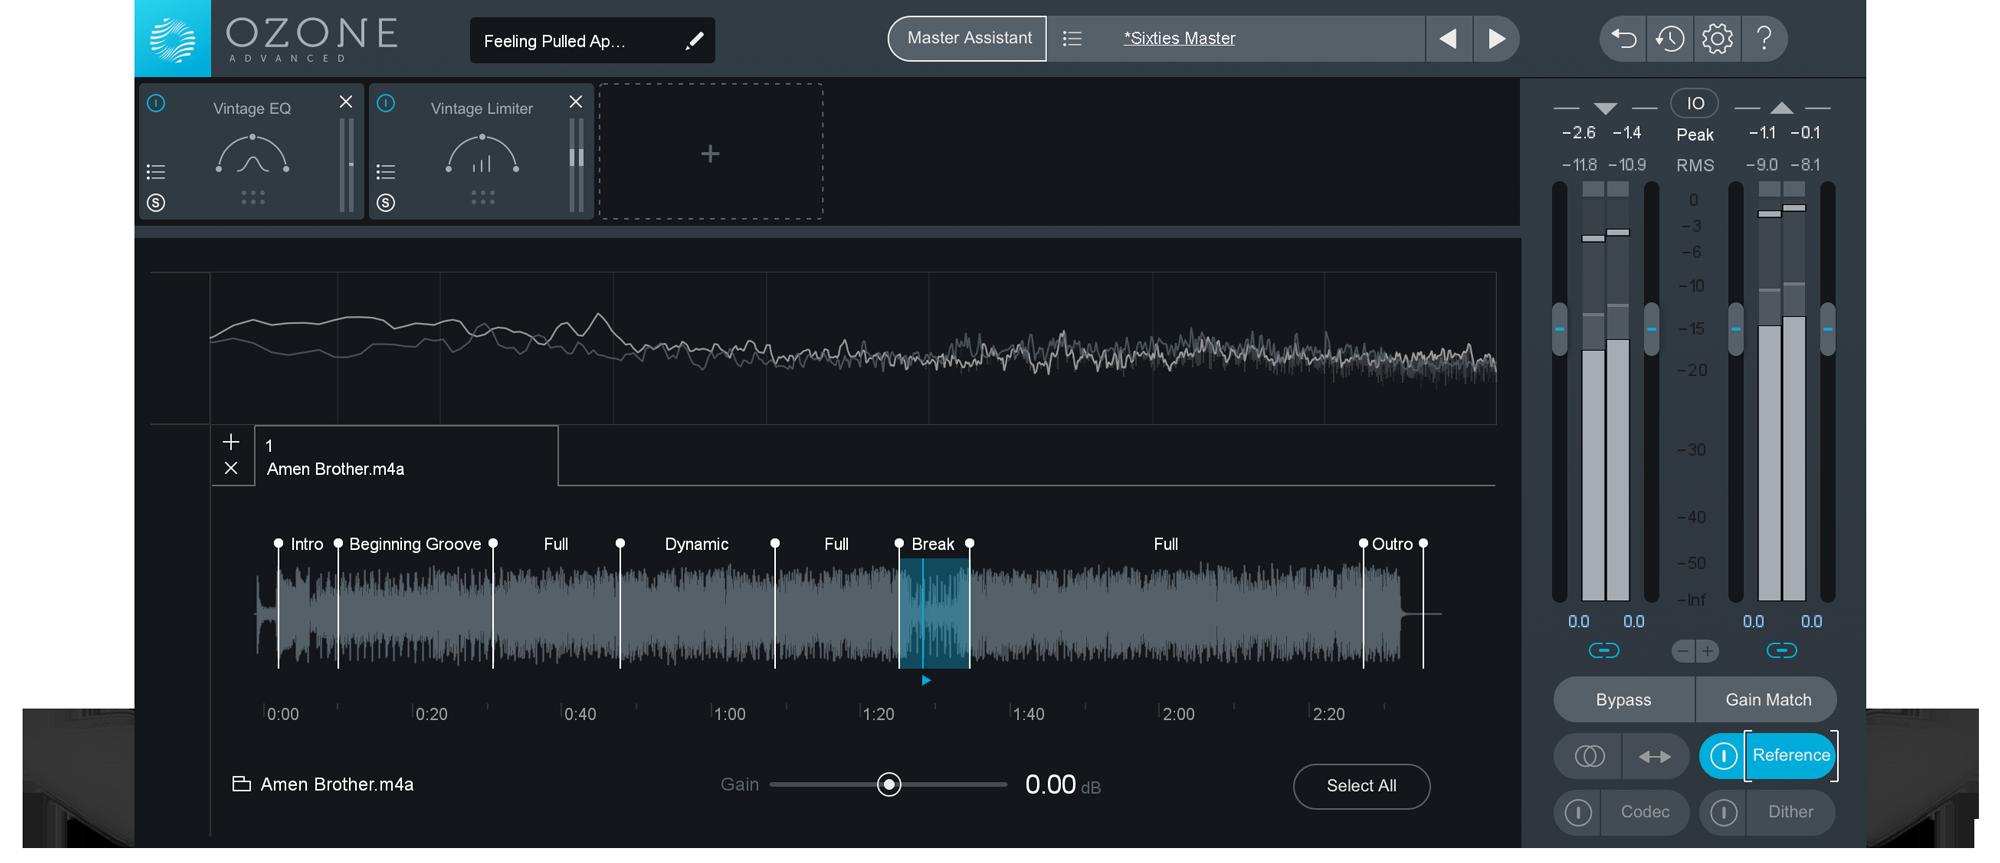 iZotope Ozone 8 | The Future of Audio Mastering